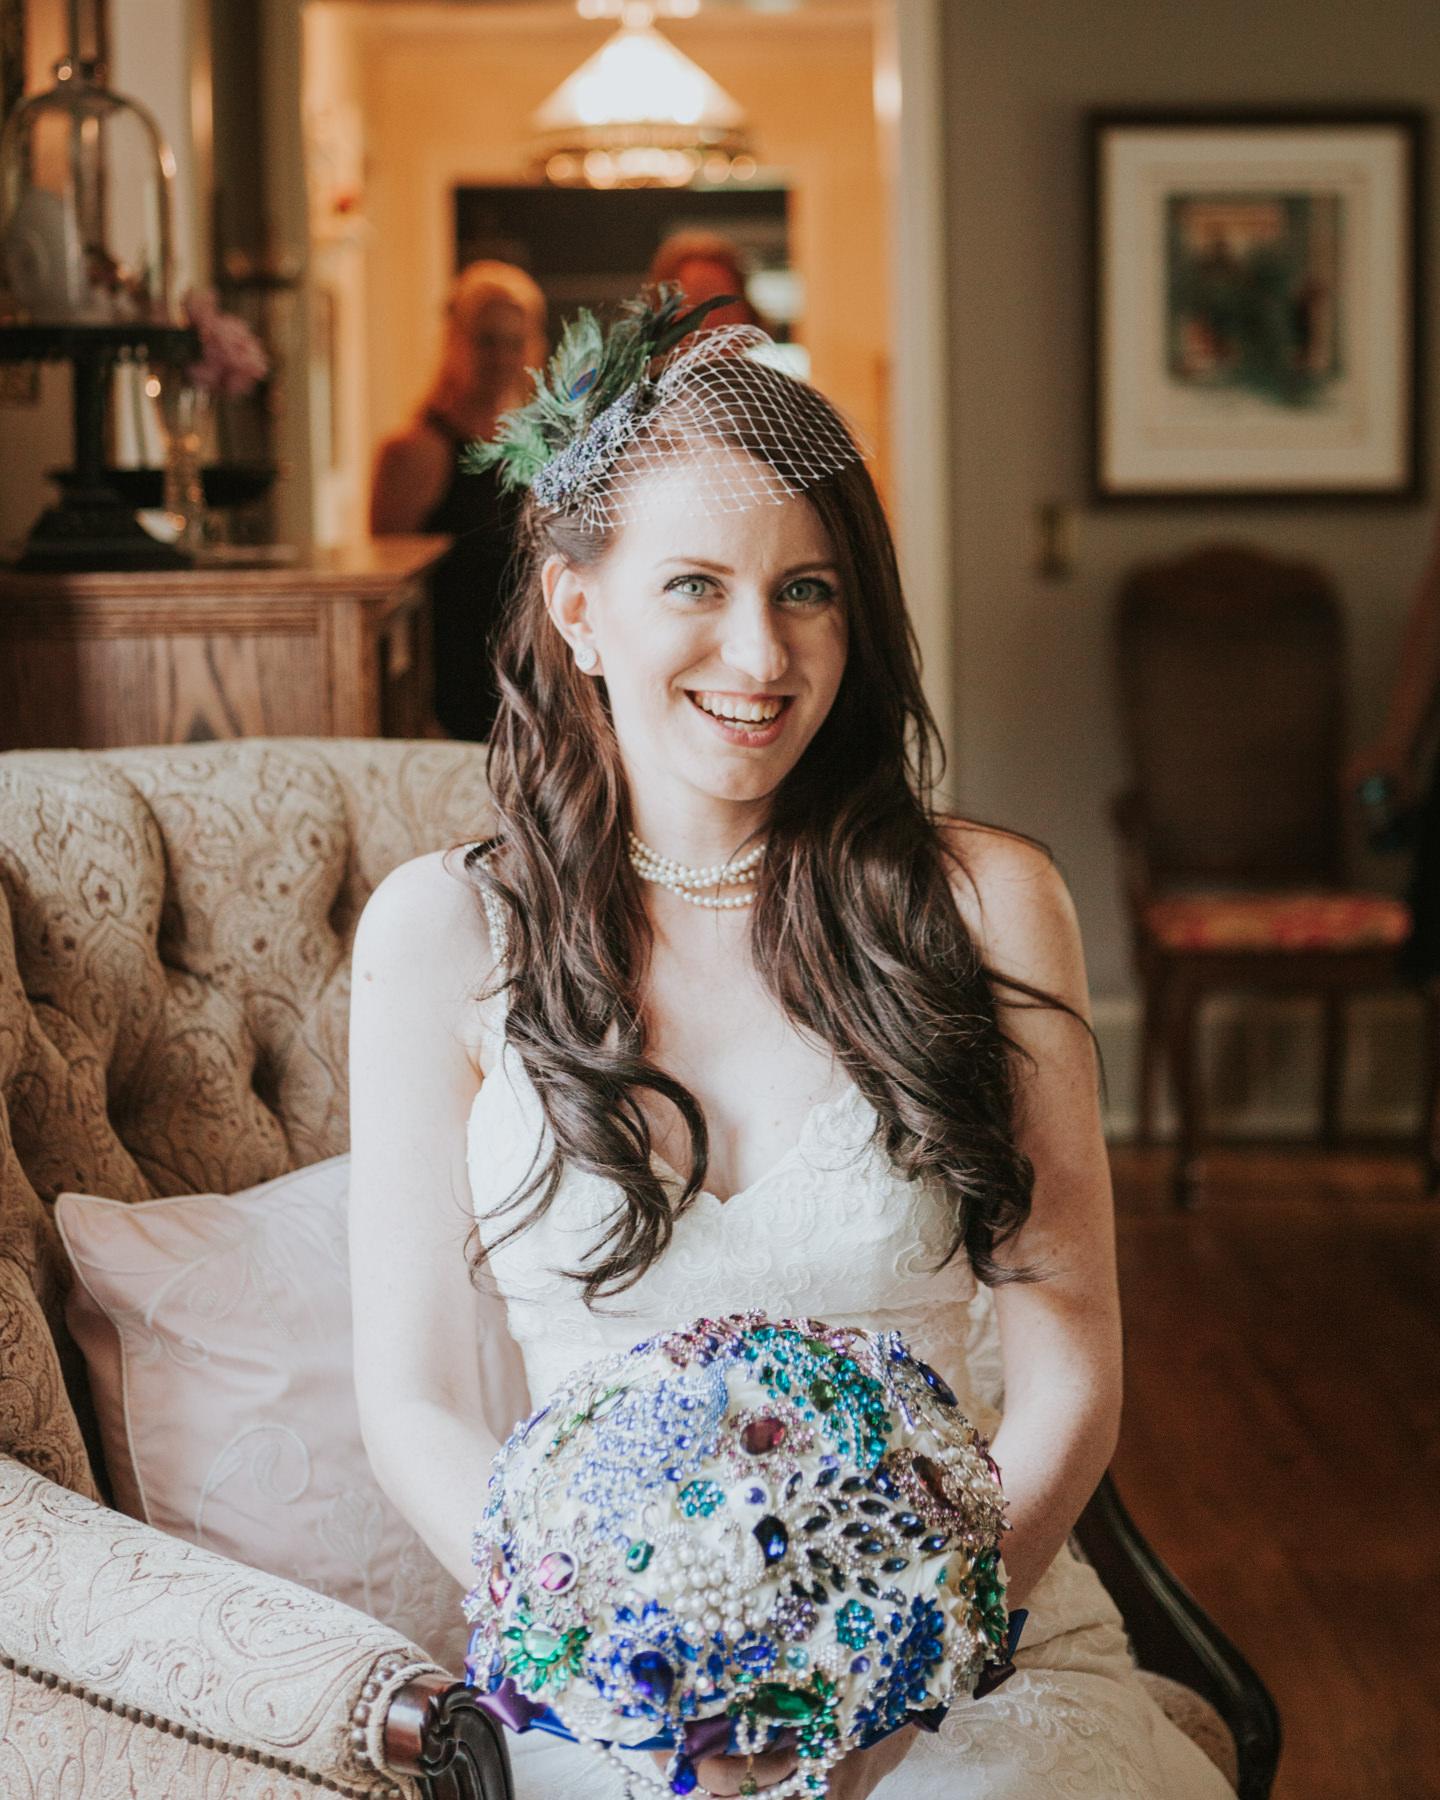 Vancouver wedding photographer - Pam 9